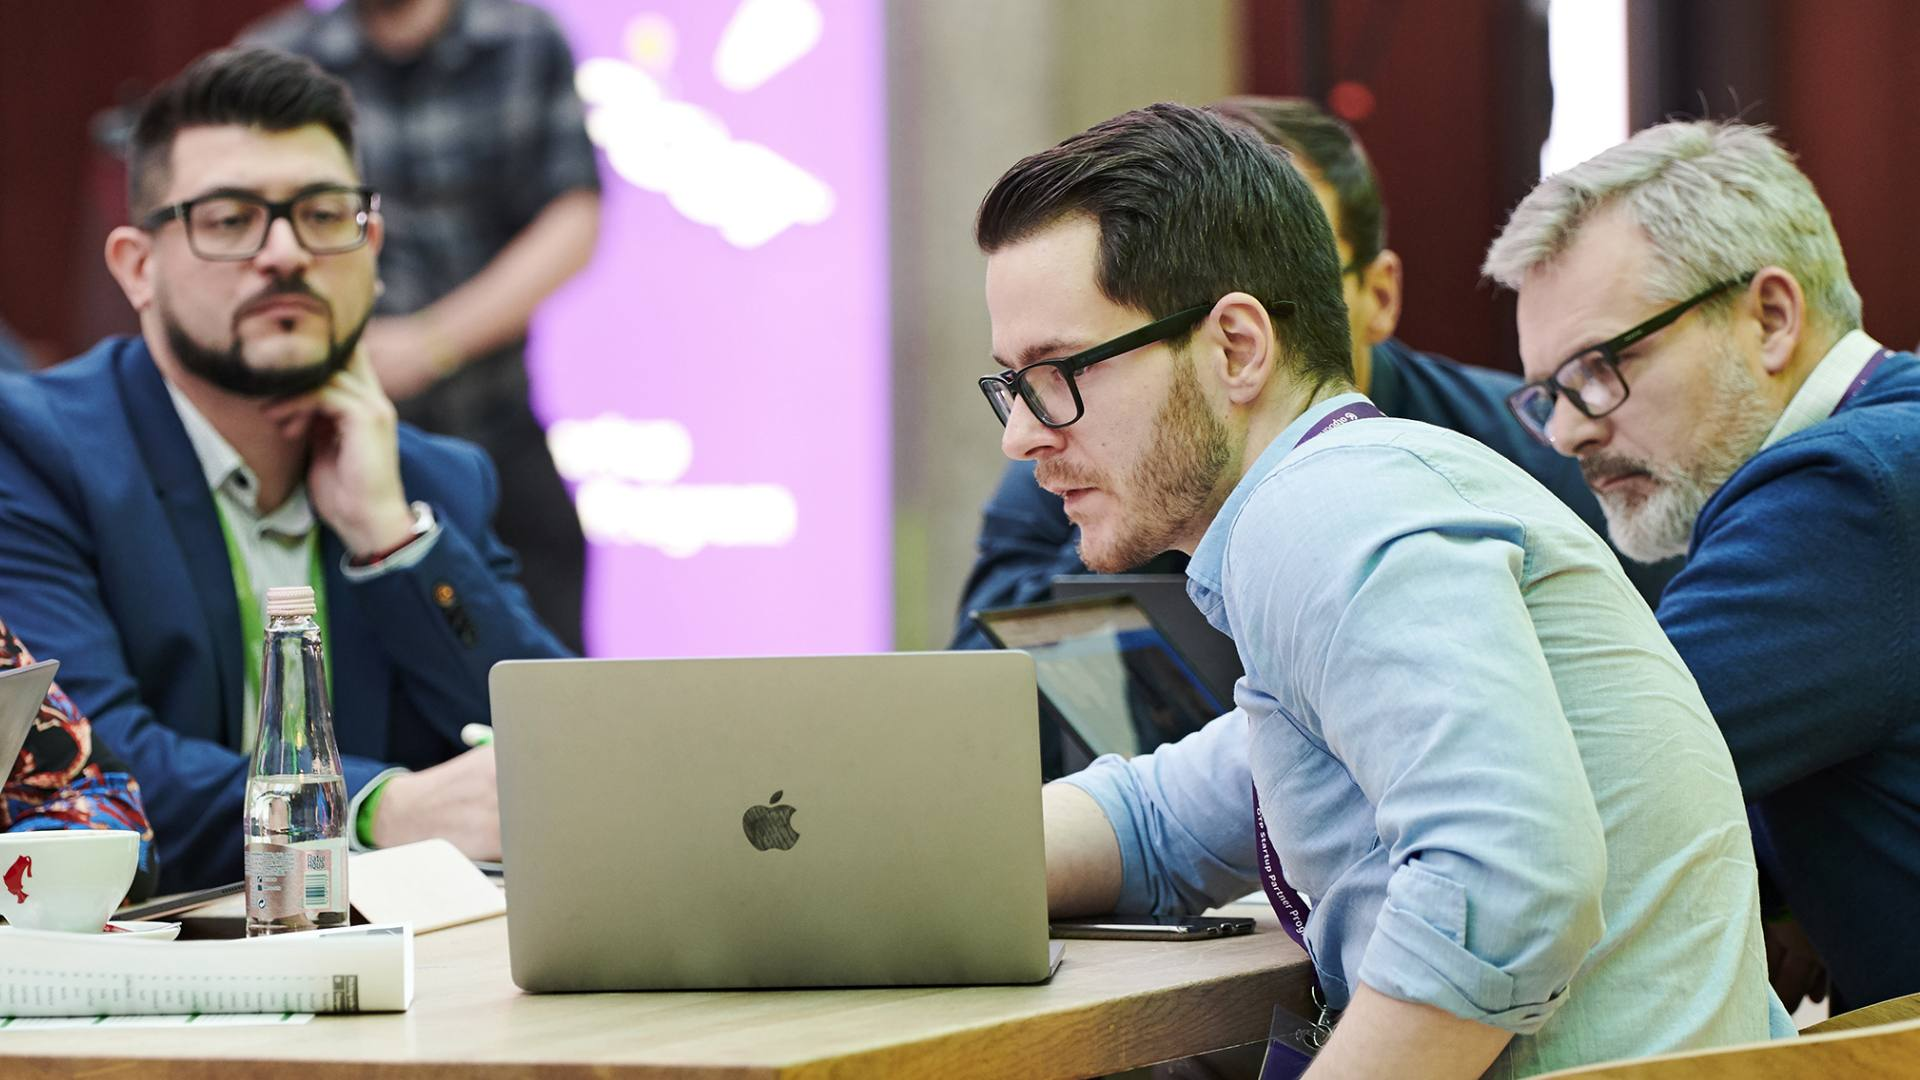 otplab startup partner program